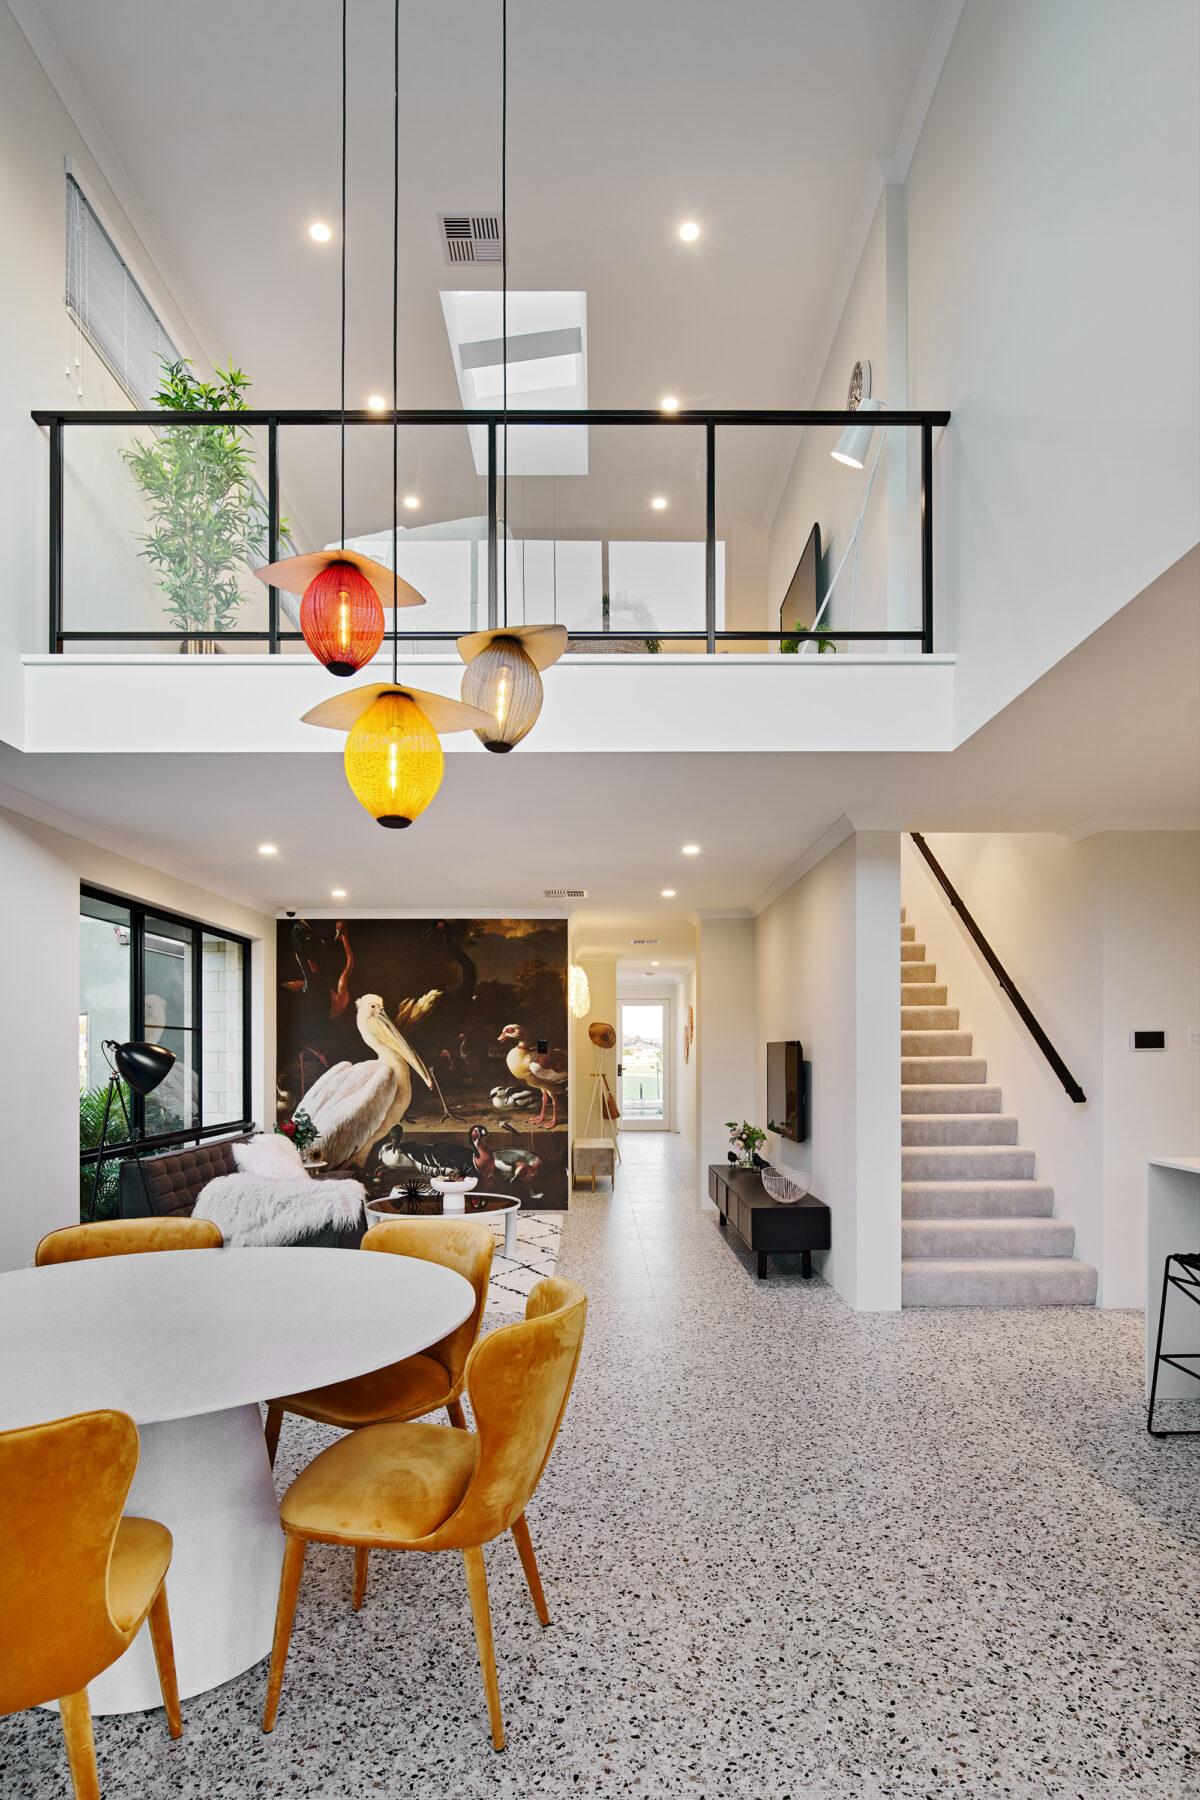 Stunning kitchen with overlooking void